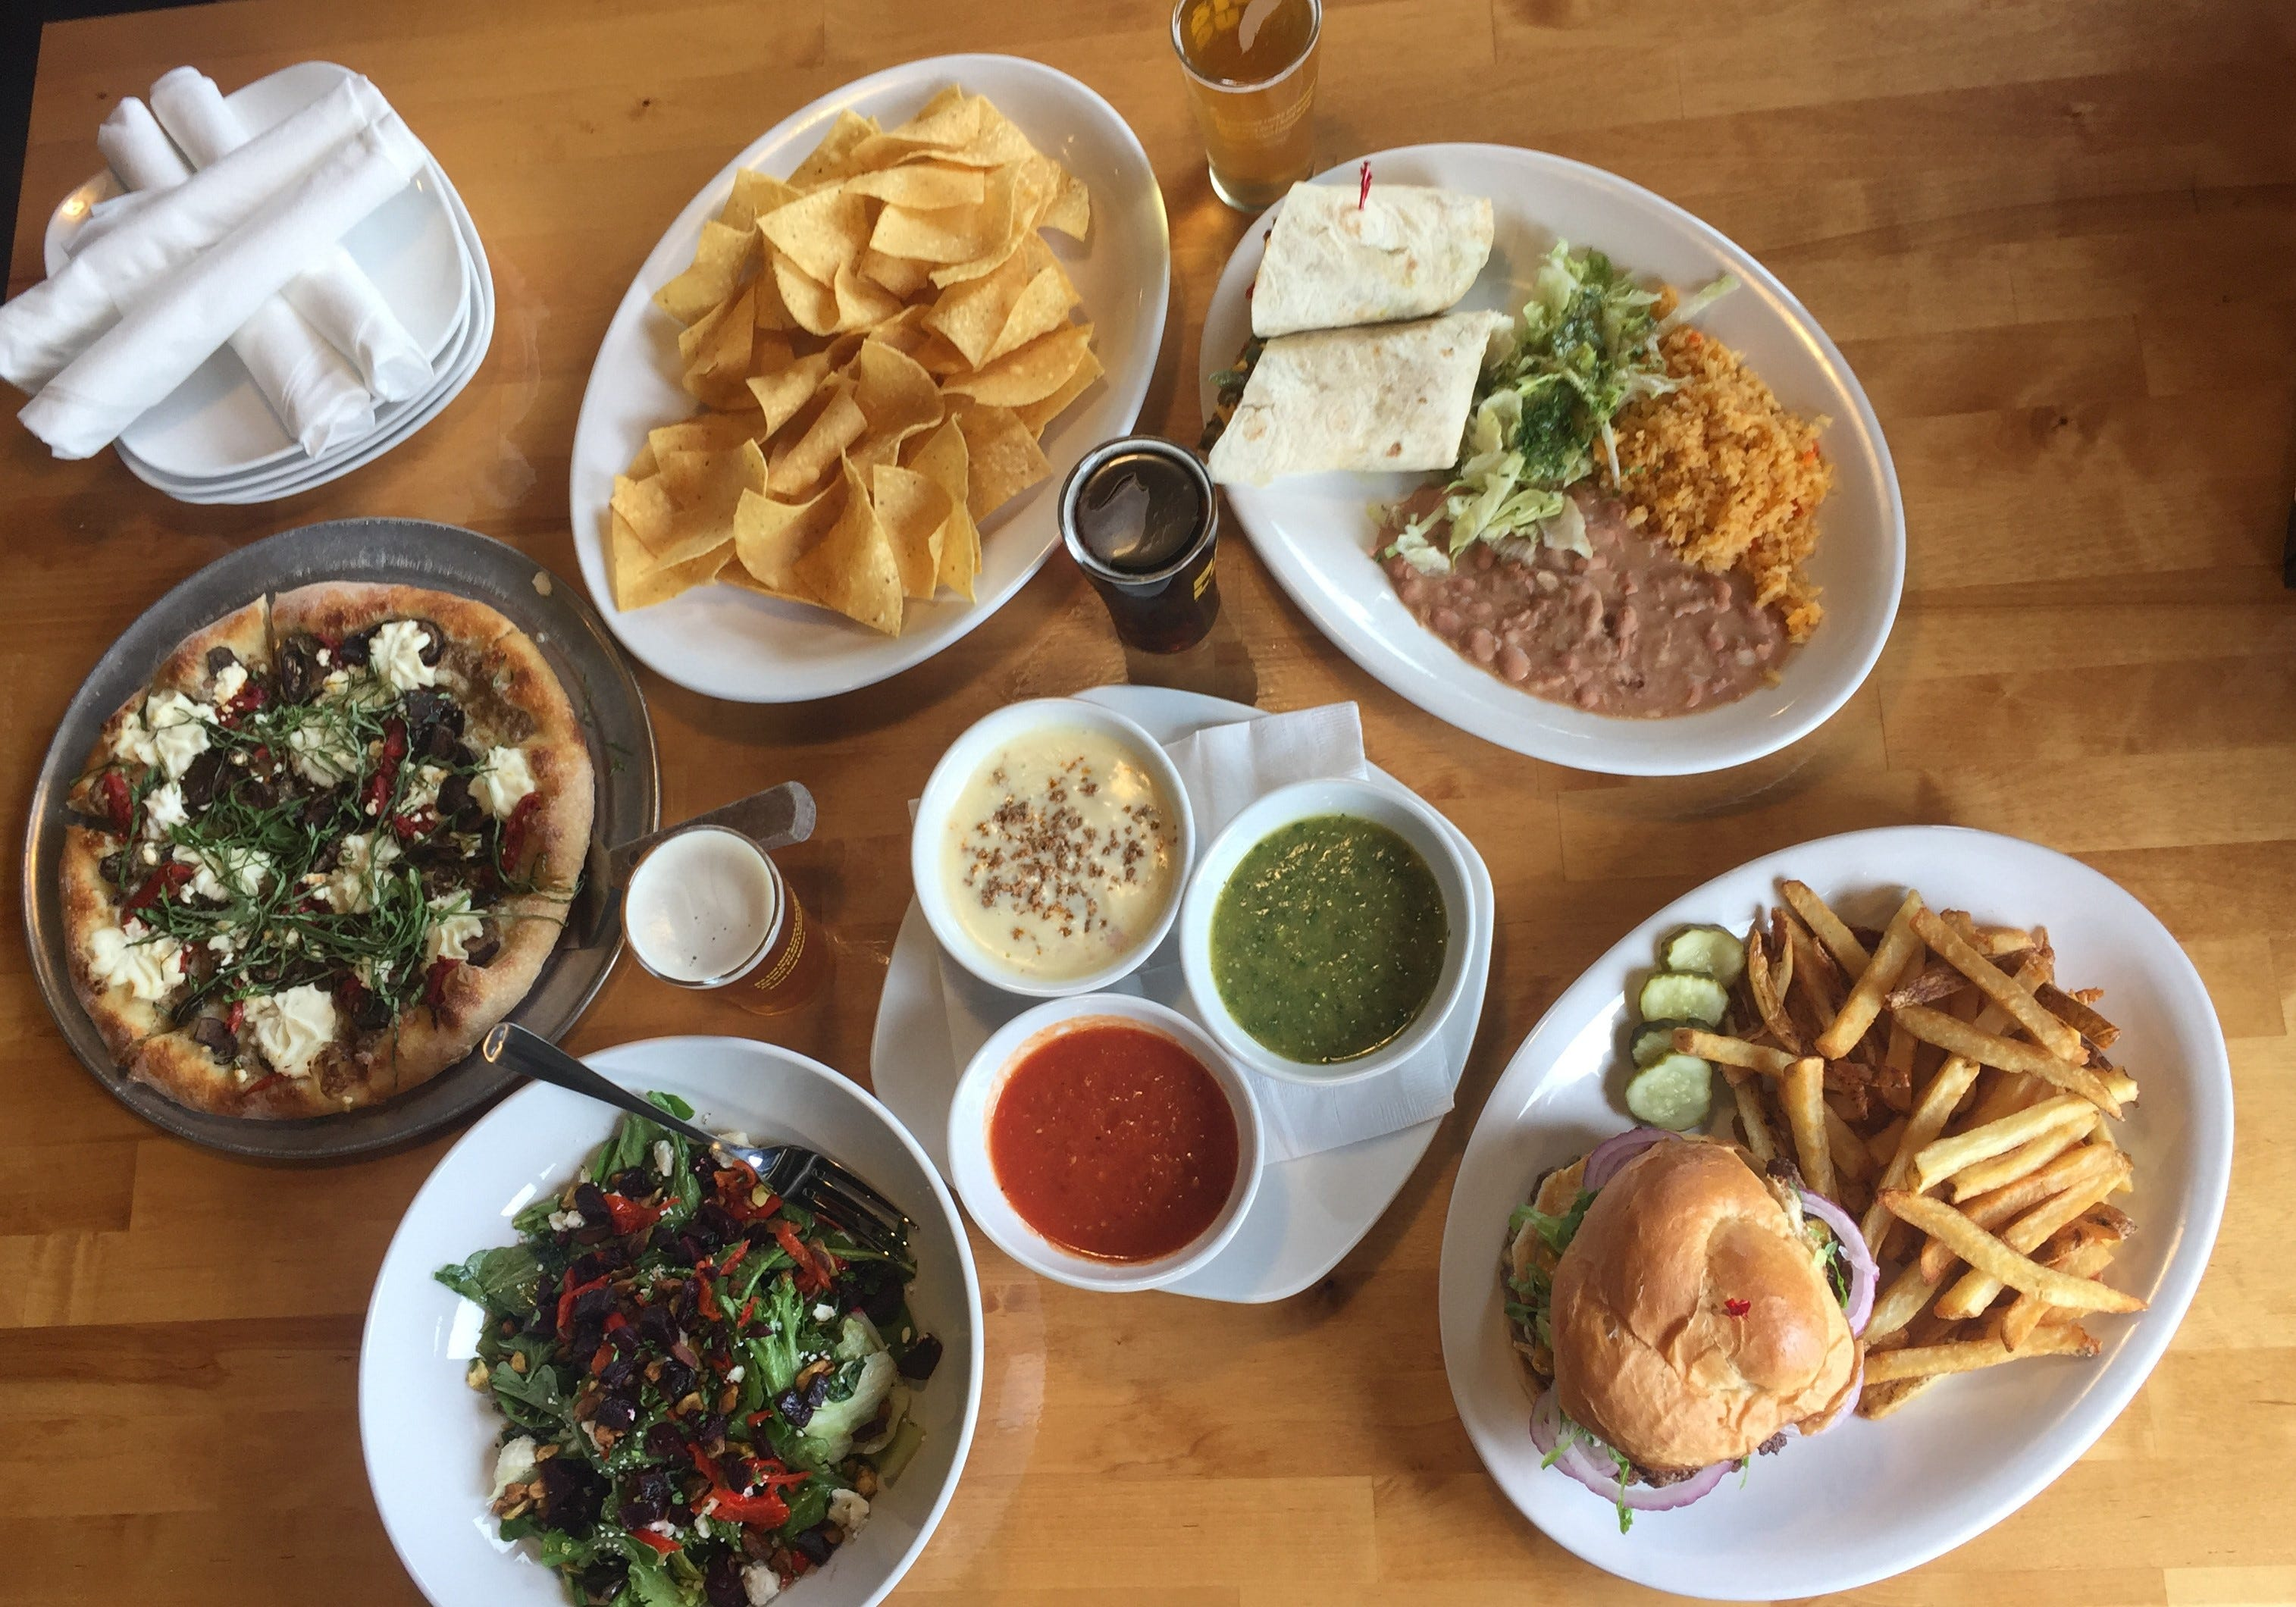 https://www.indystar.com/story/entertainment/dining/restaurants ...